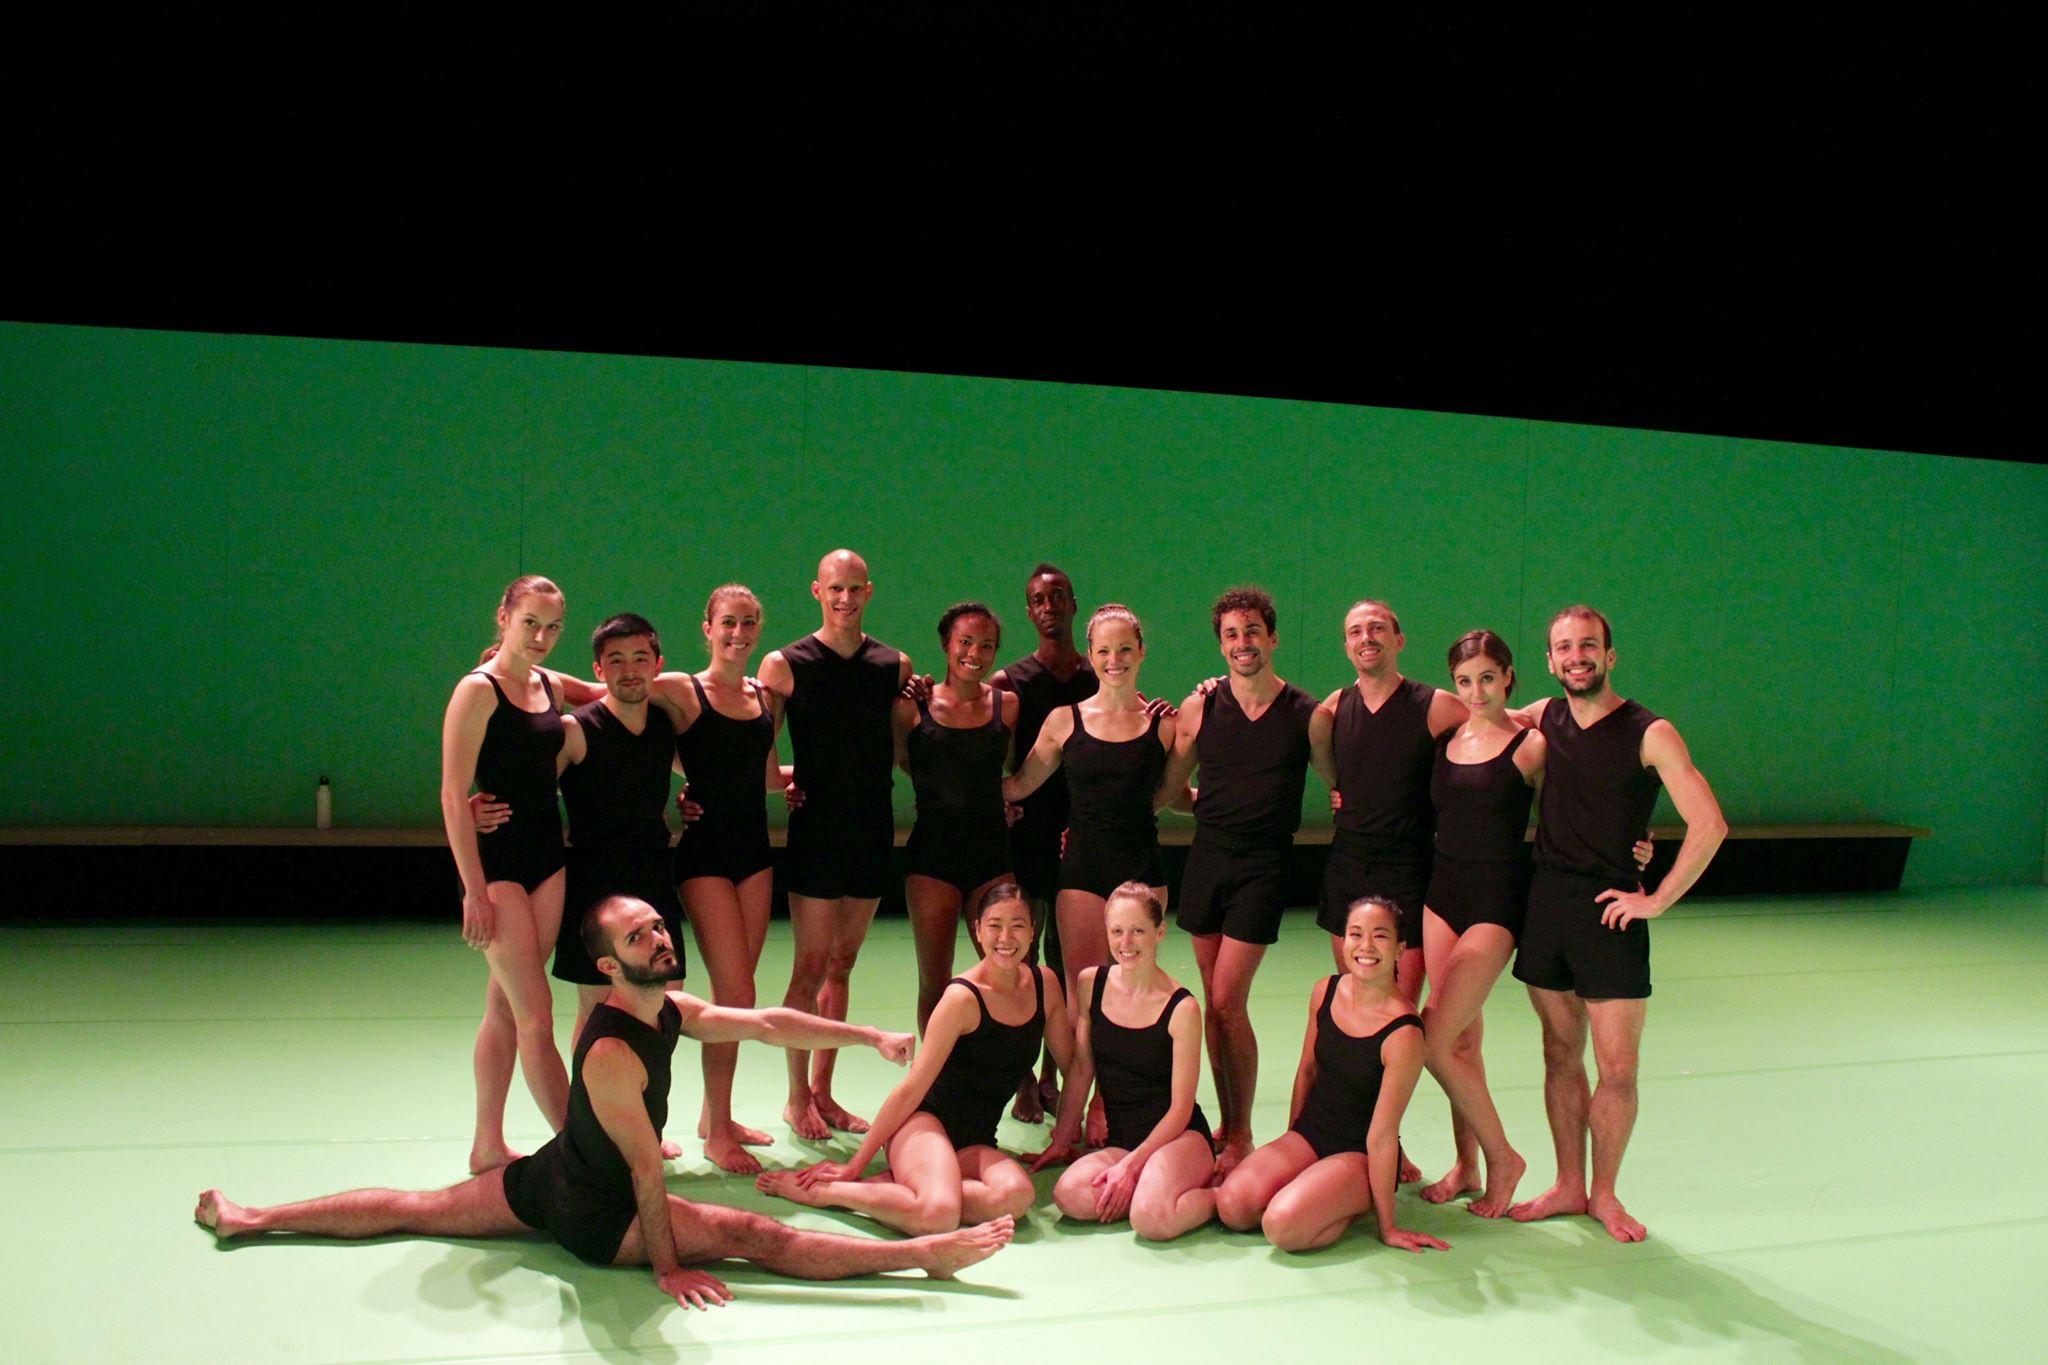 84374b56dab73 ダンサーの宝箱 - 海外で働く若きダンサーたちの今を知りたい! -